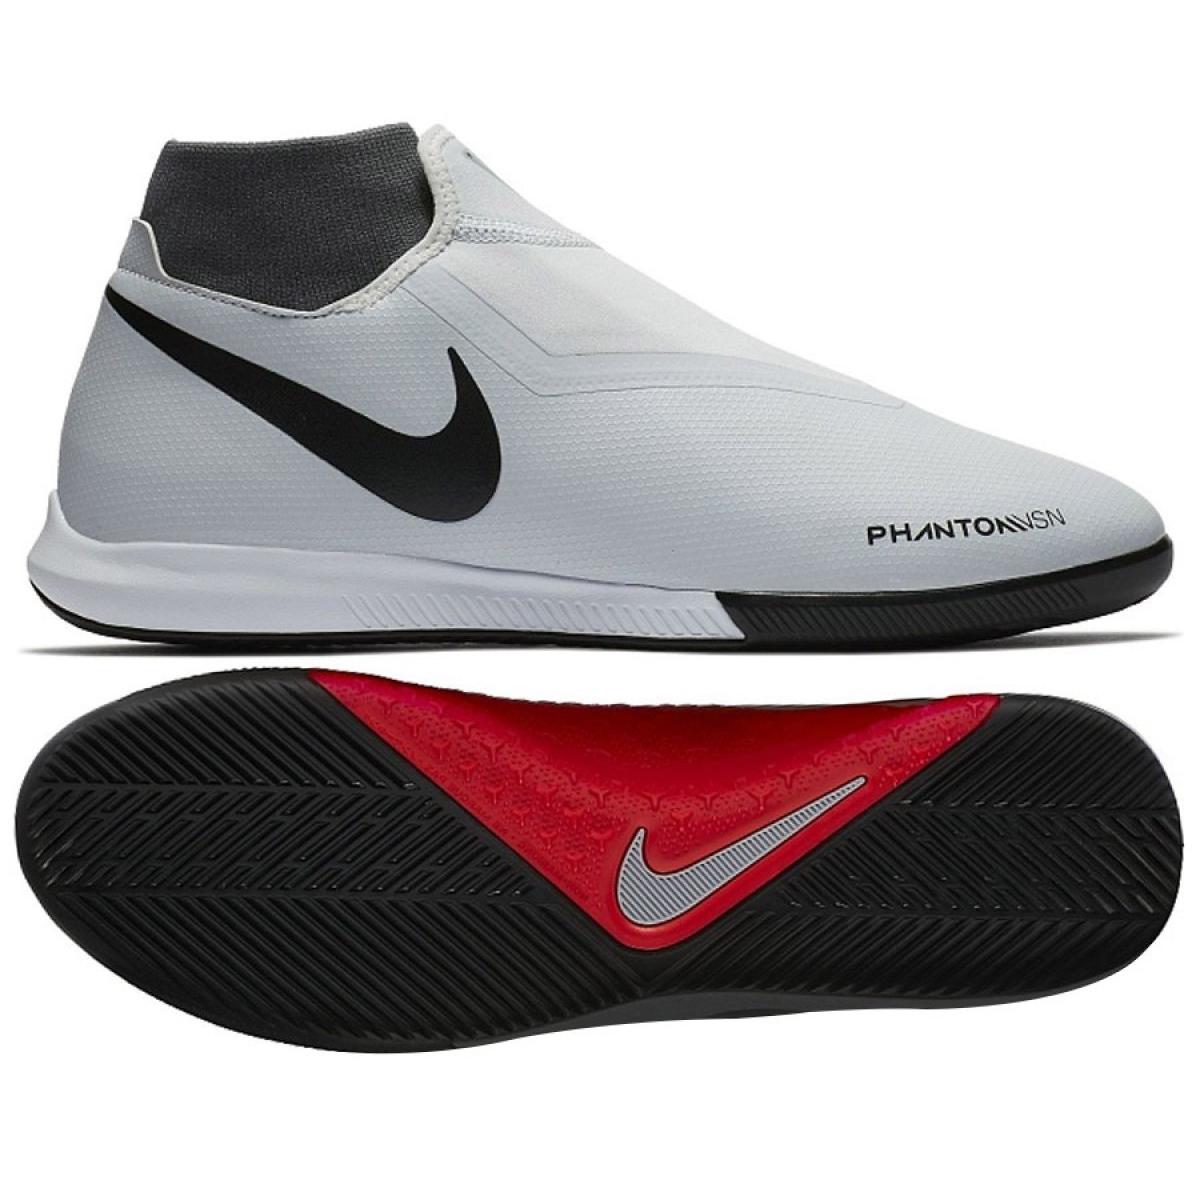 Sapatos de interior Nike Phantom Vsn Academia Df Ic M AO3267 060 branco branco